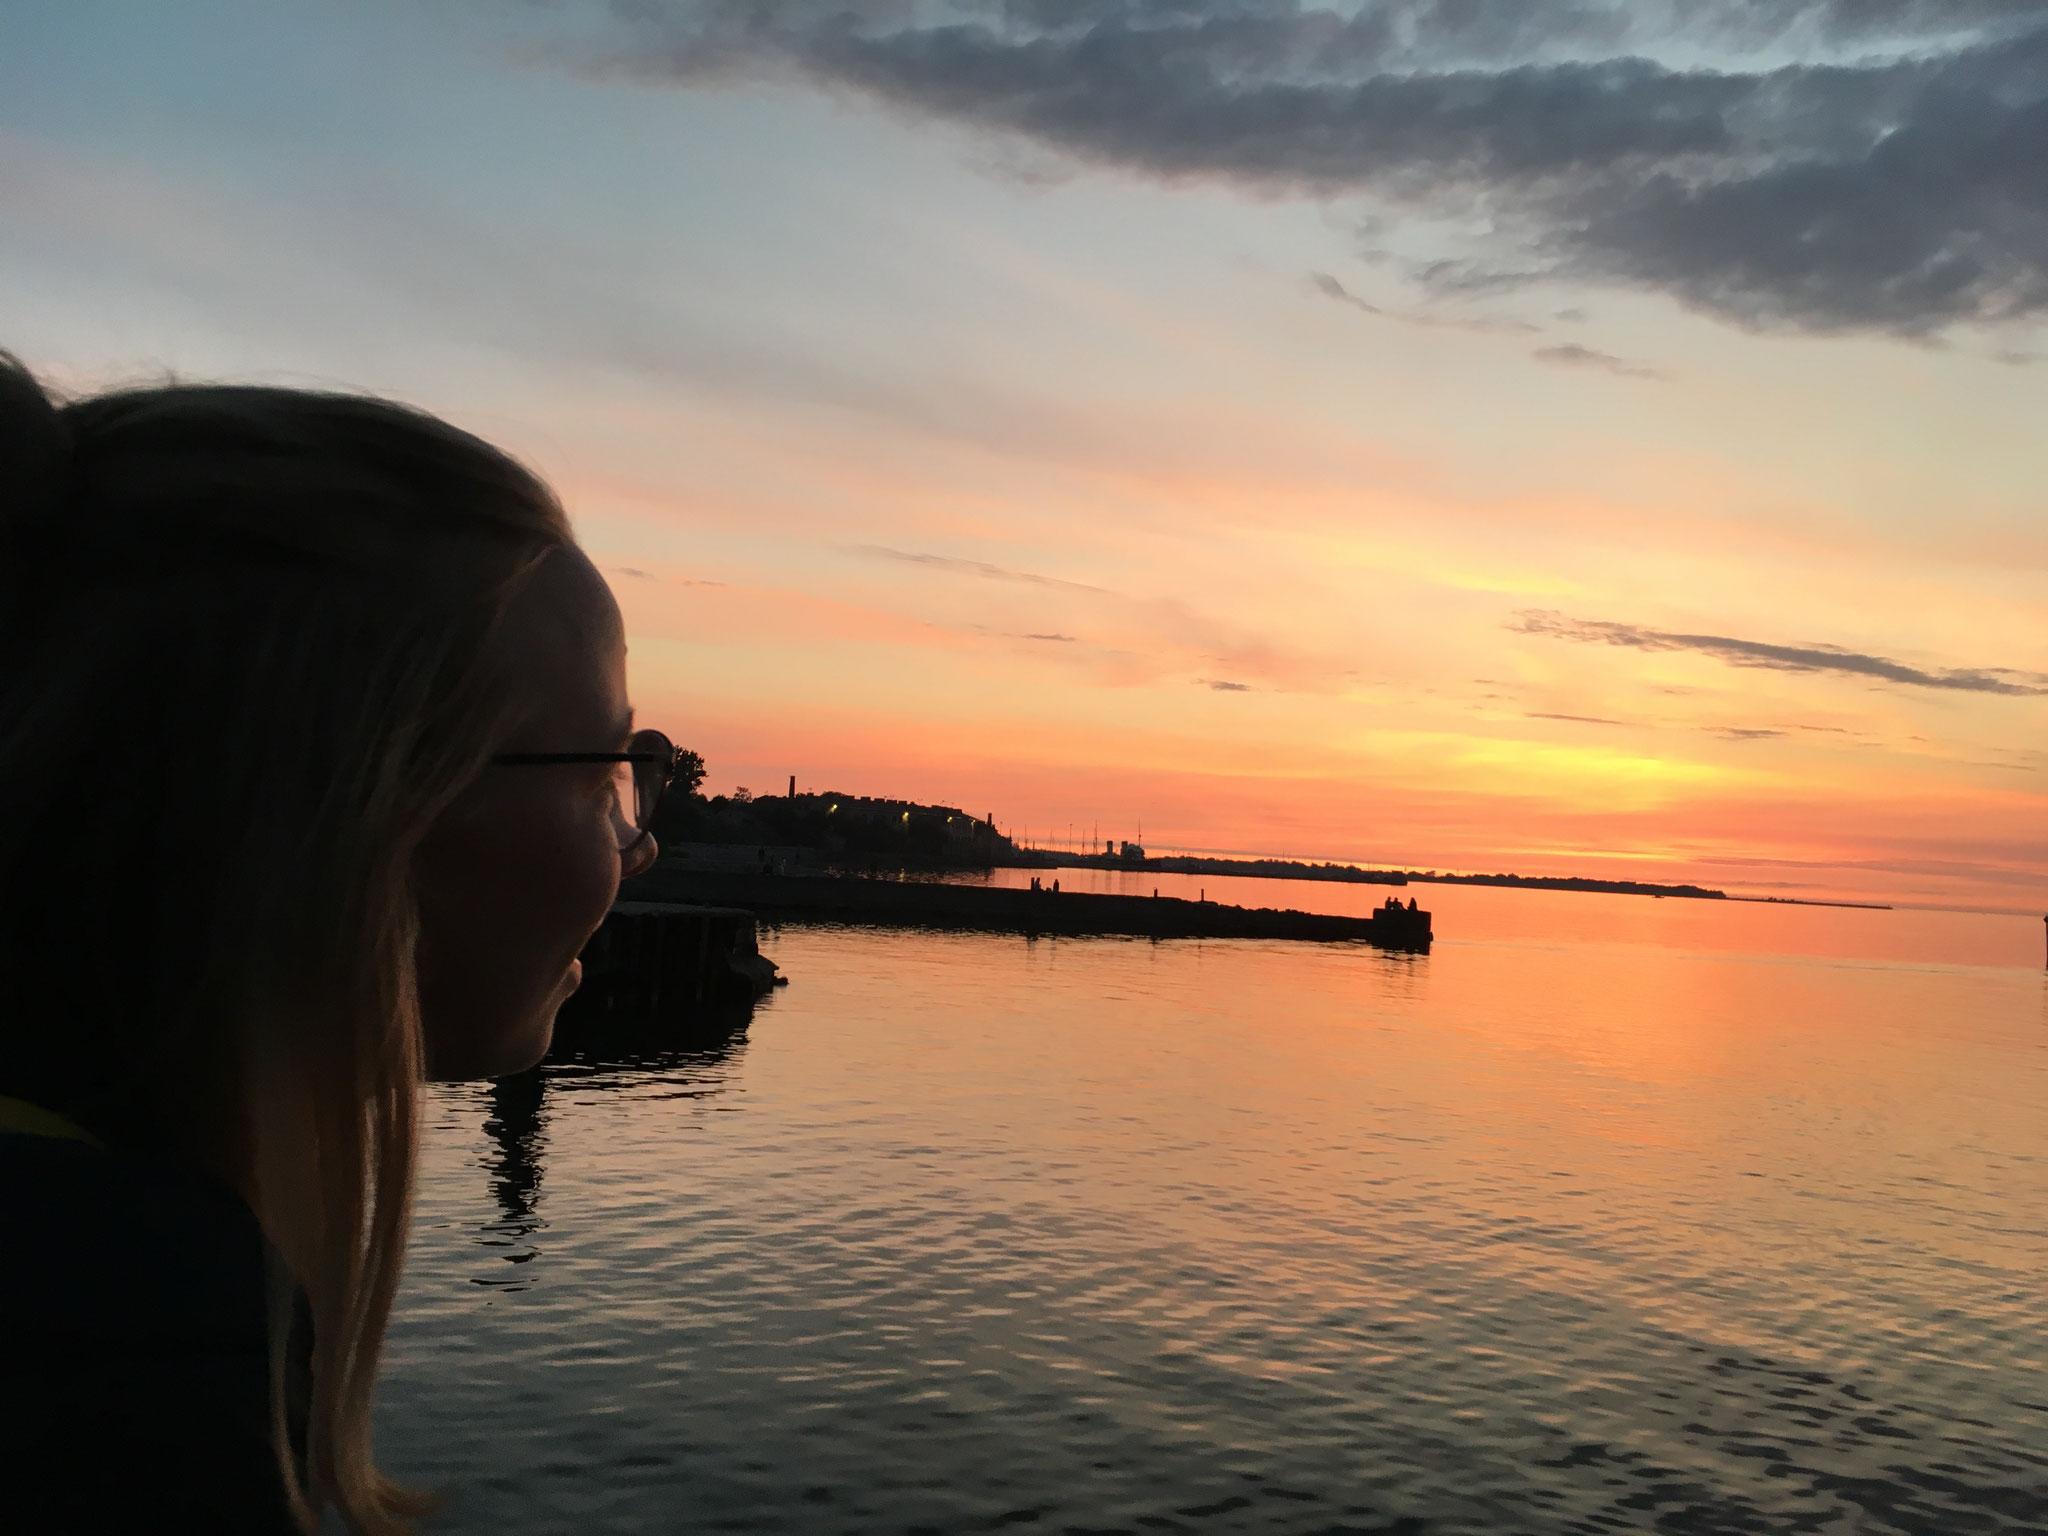 Sonnenuntergang in Tallinn